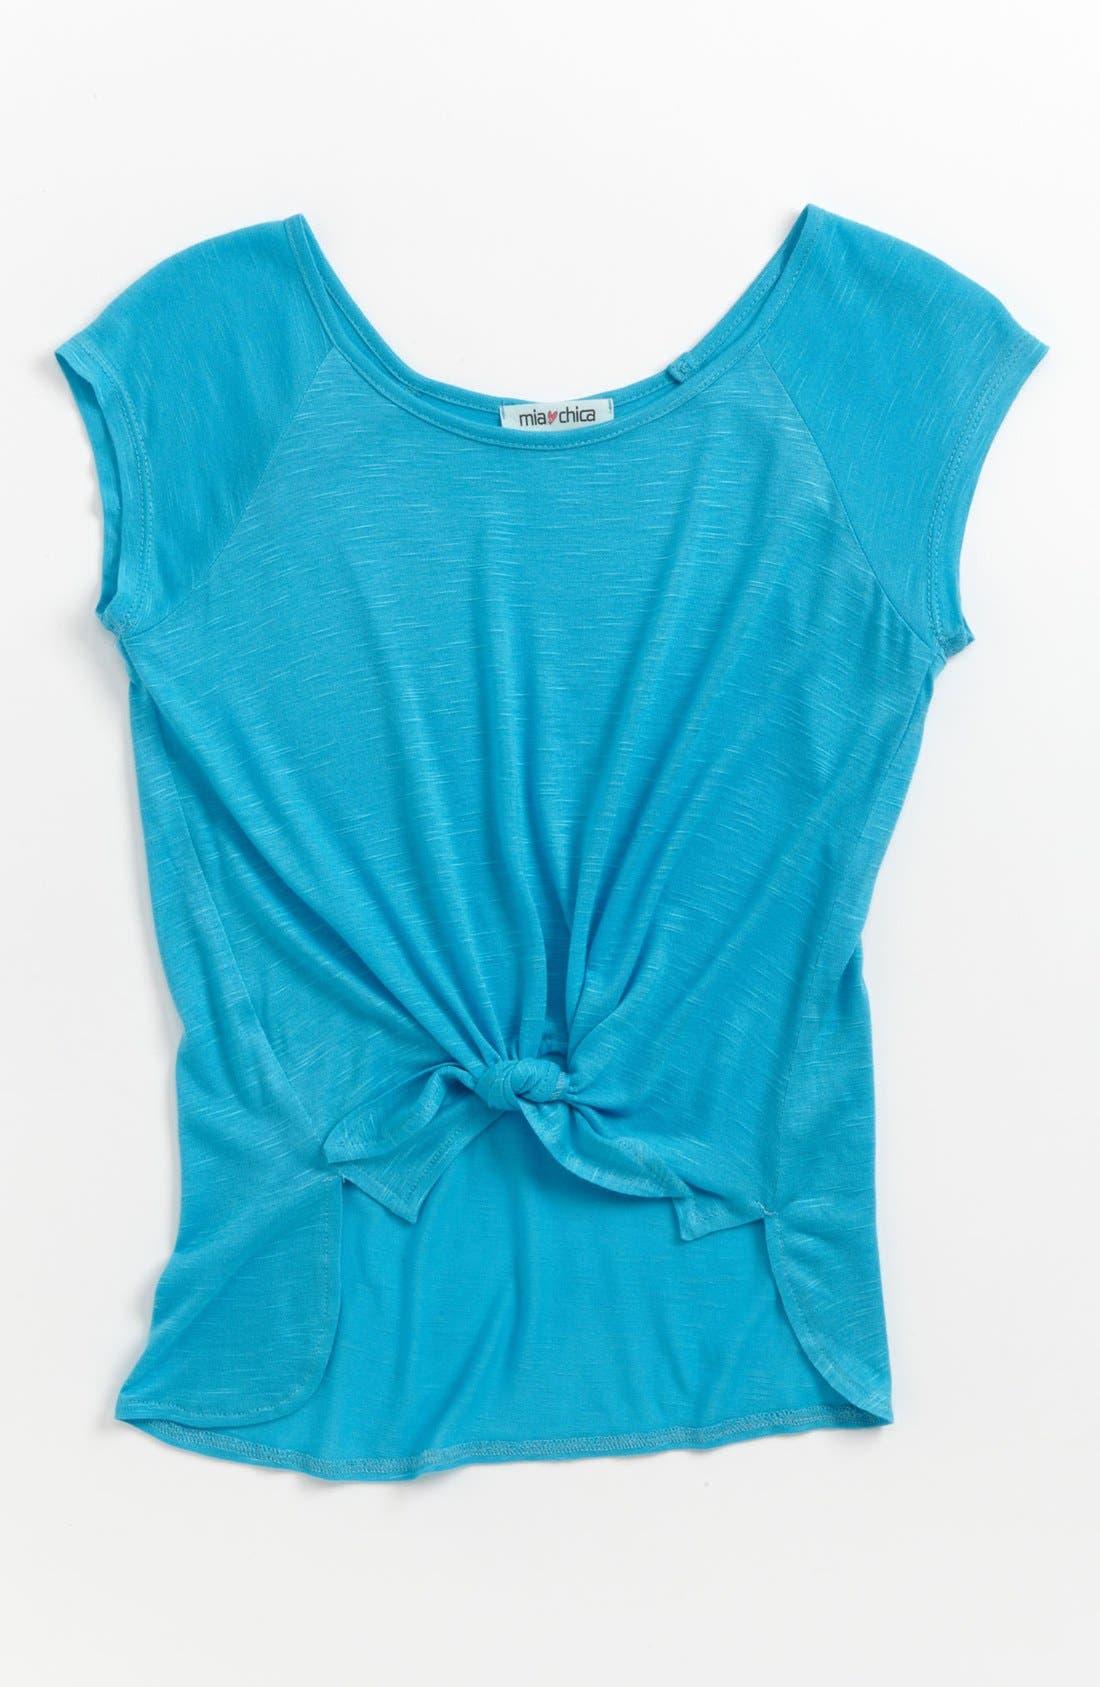 Main Image - Mia Chica Tie Dye Top (Big Girls)